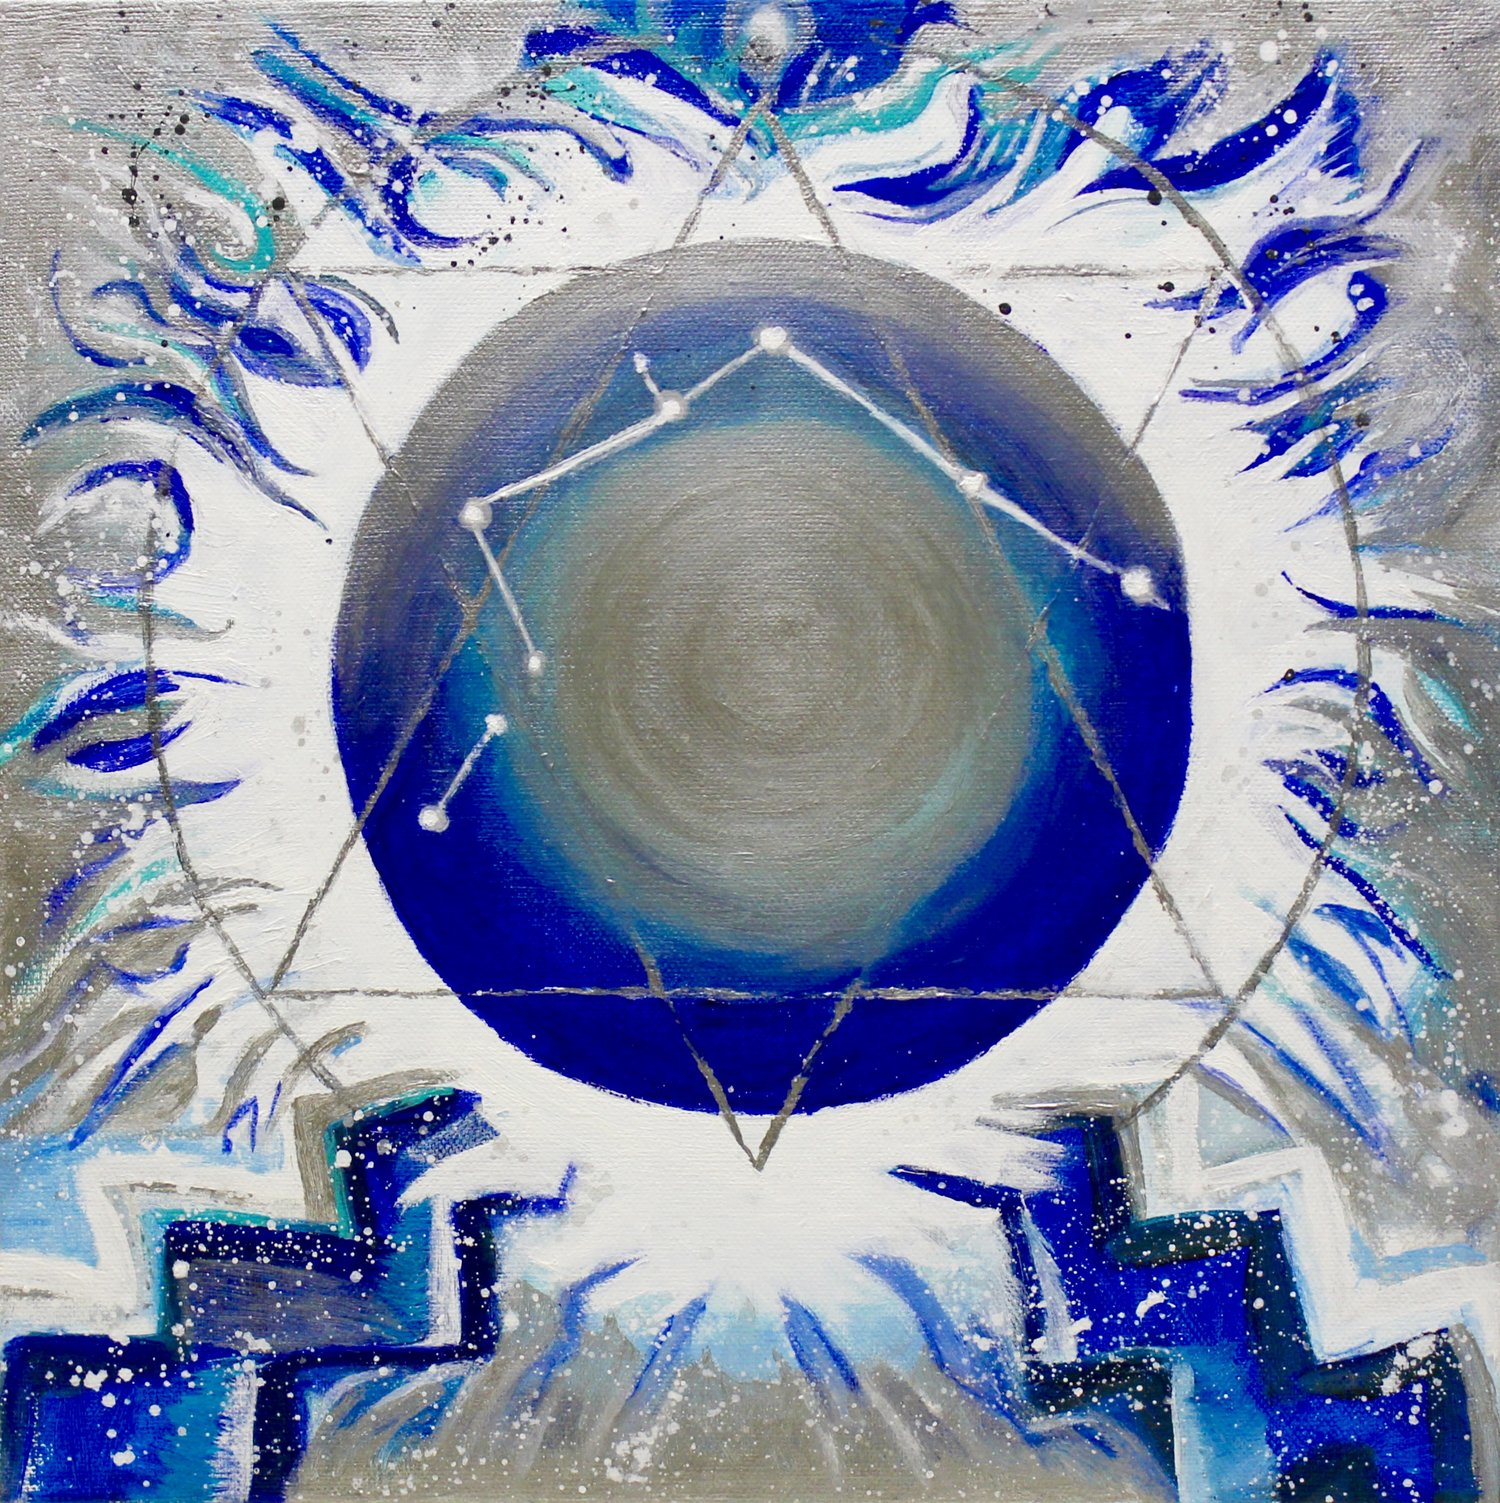 Aquarius Painting.jpeg